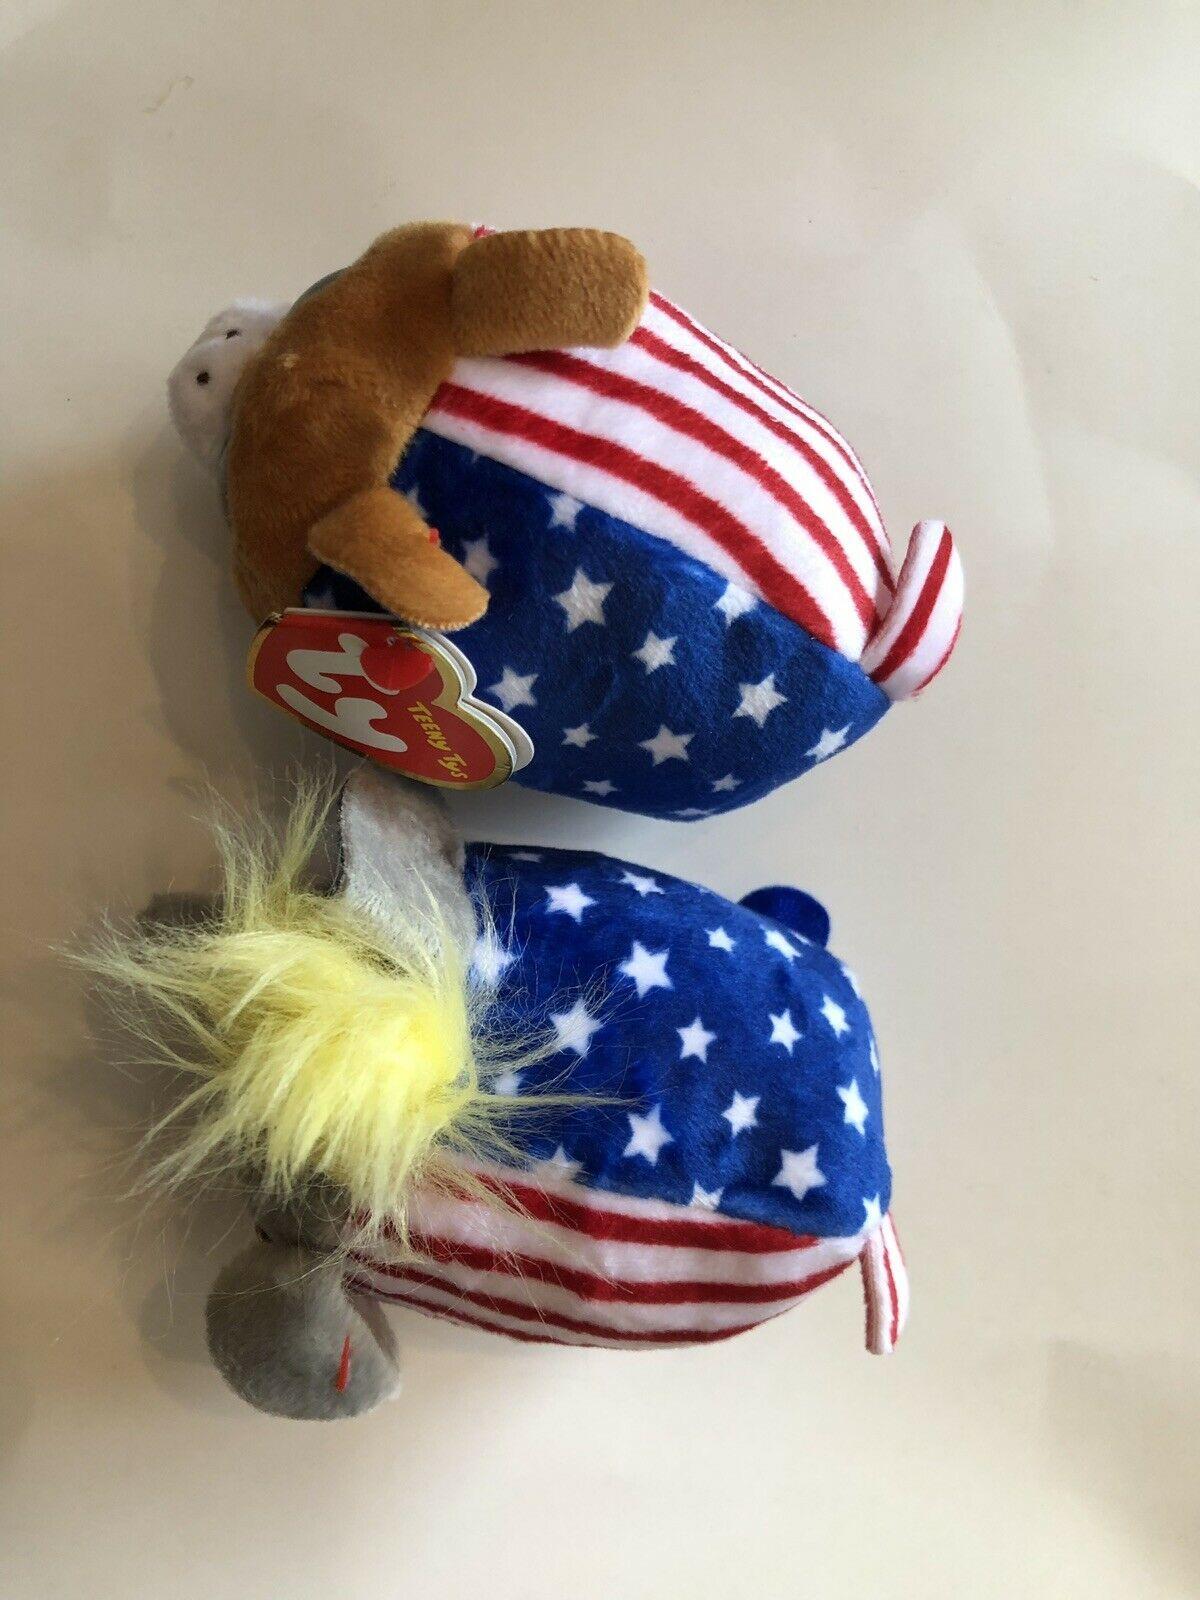 TEENY TYS TY VOTE PRESIDENT Elephant Donkey Set NEW, MINT TAG *LIMITED EDITION*